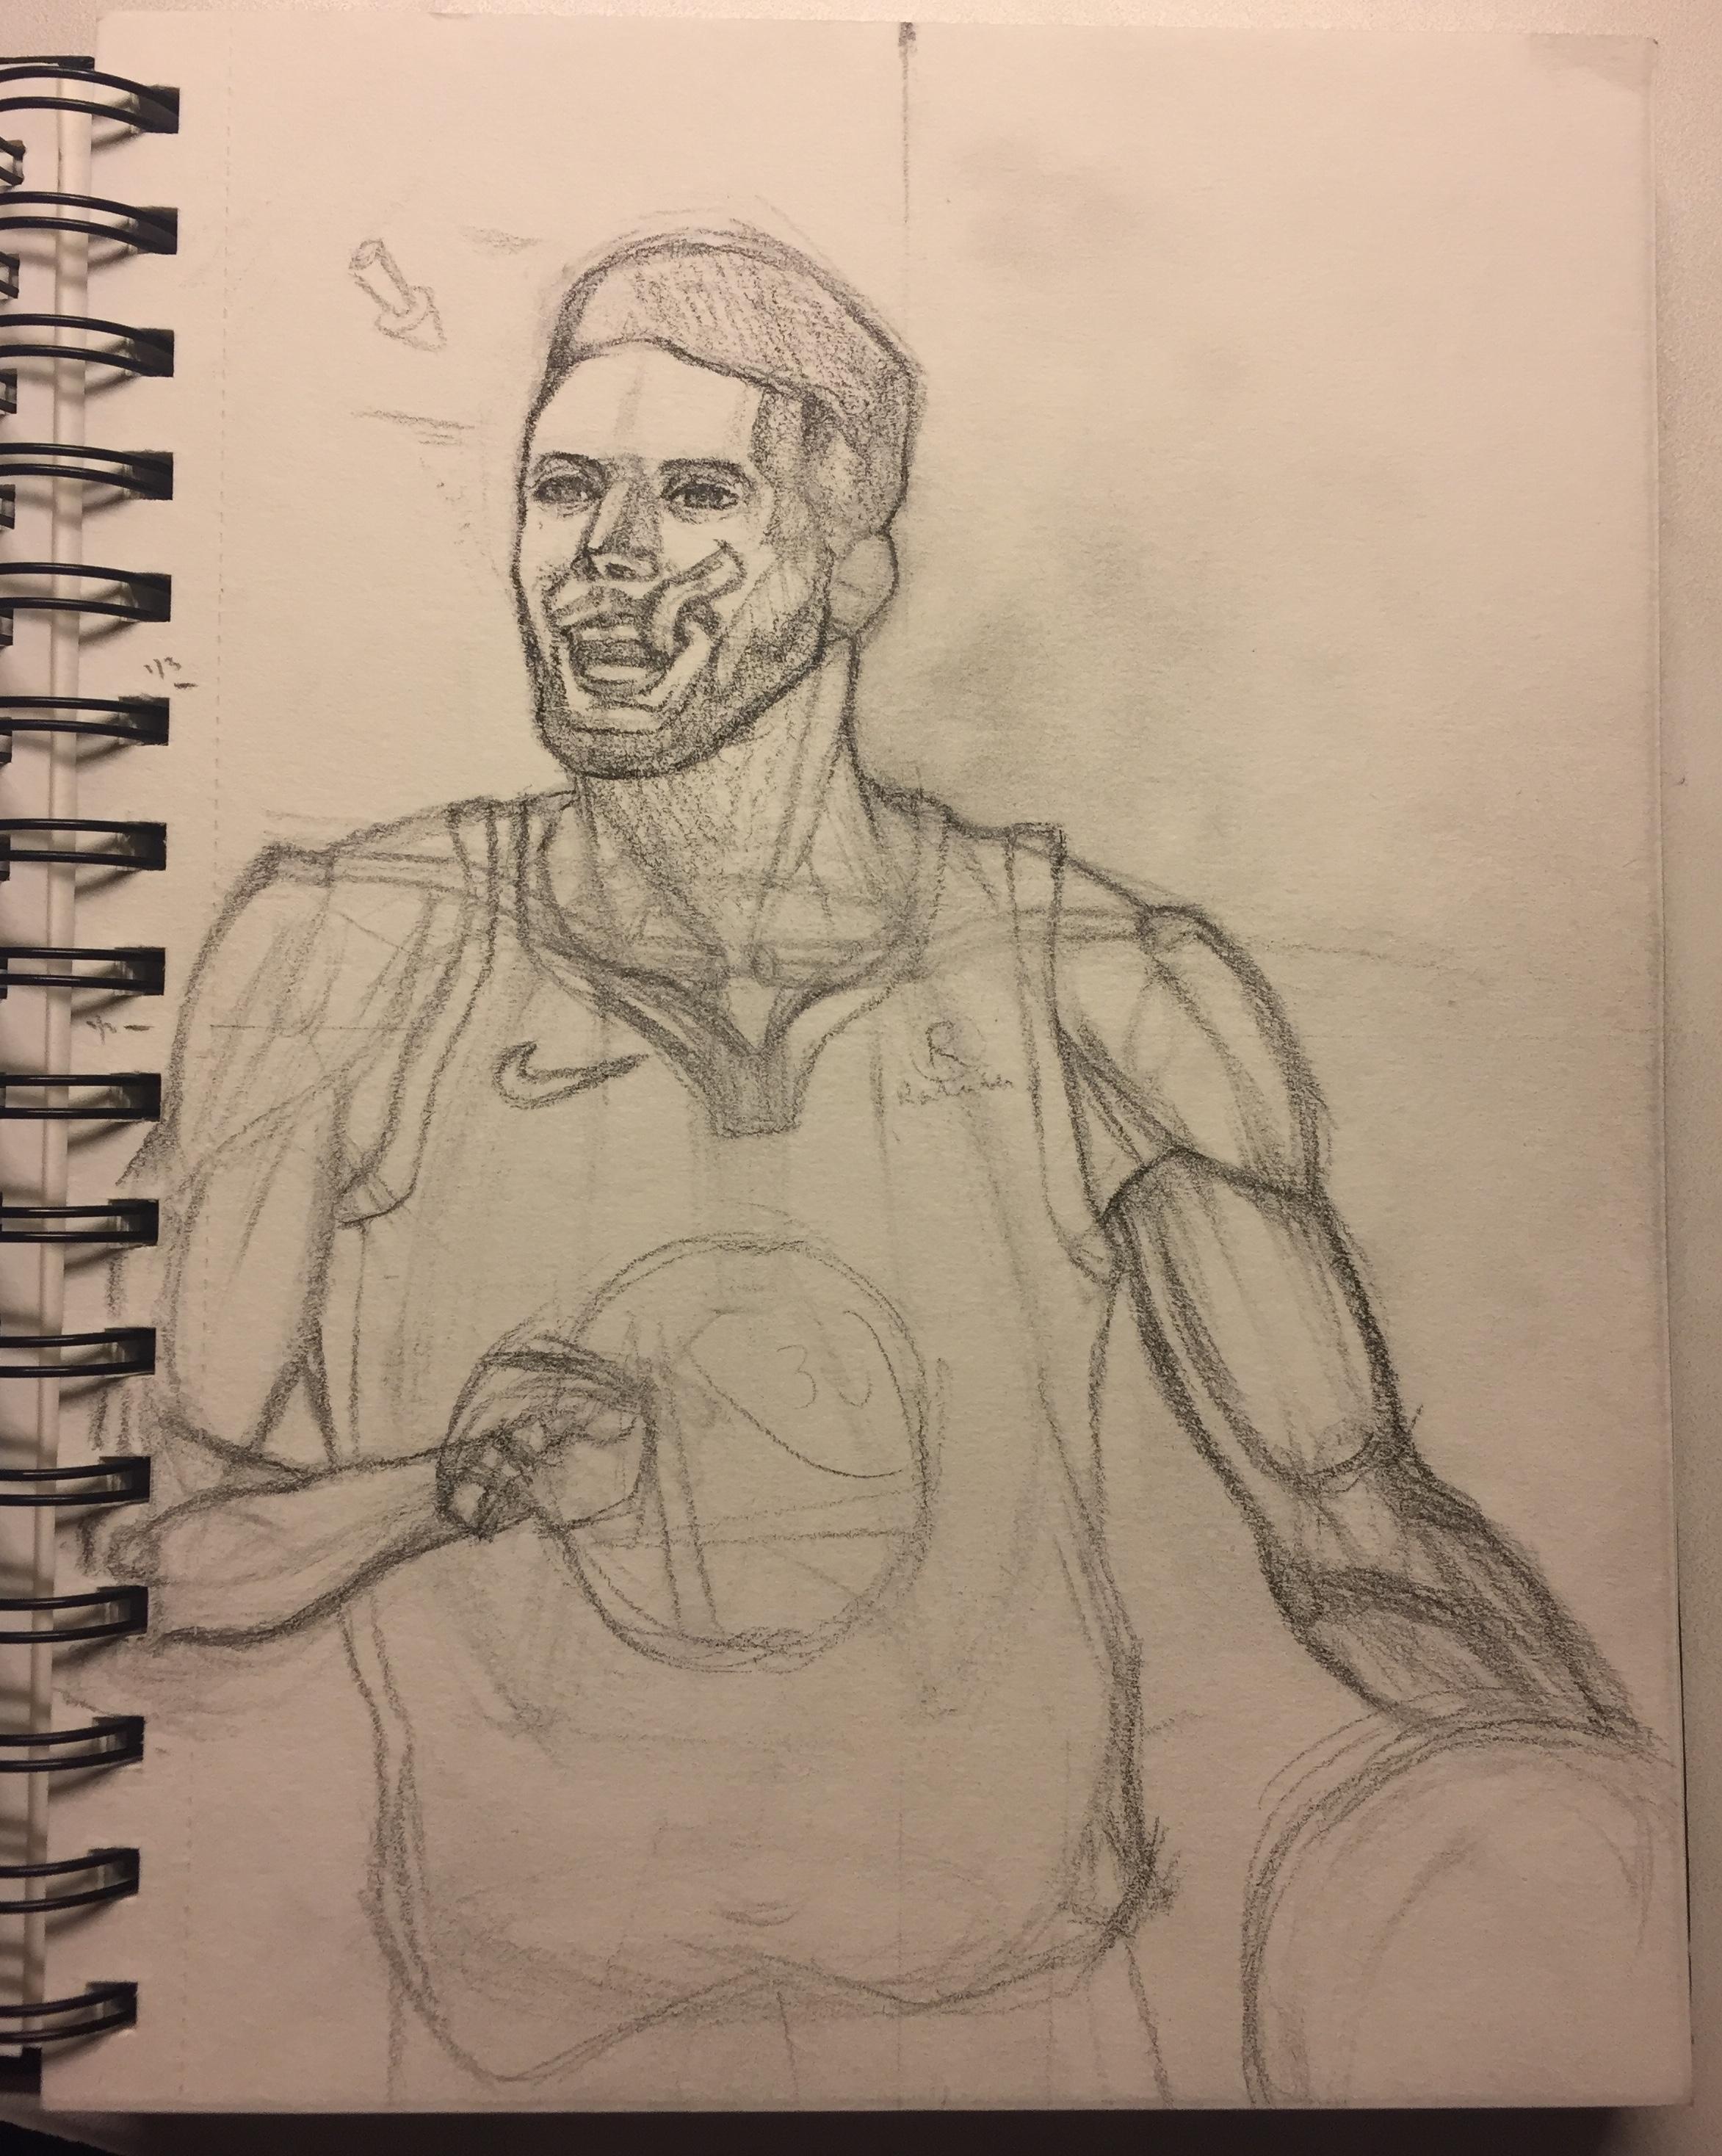 I had a lot of fun drawing Steph Curry! I hope you enjoy it! f0c110755